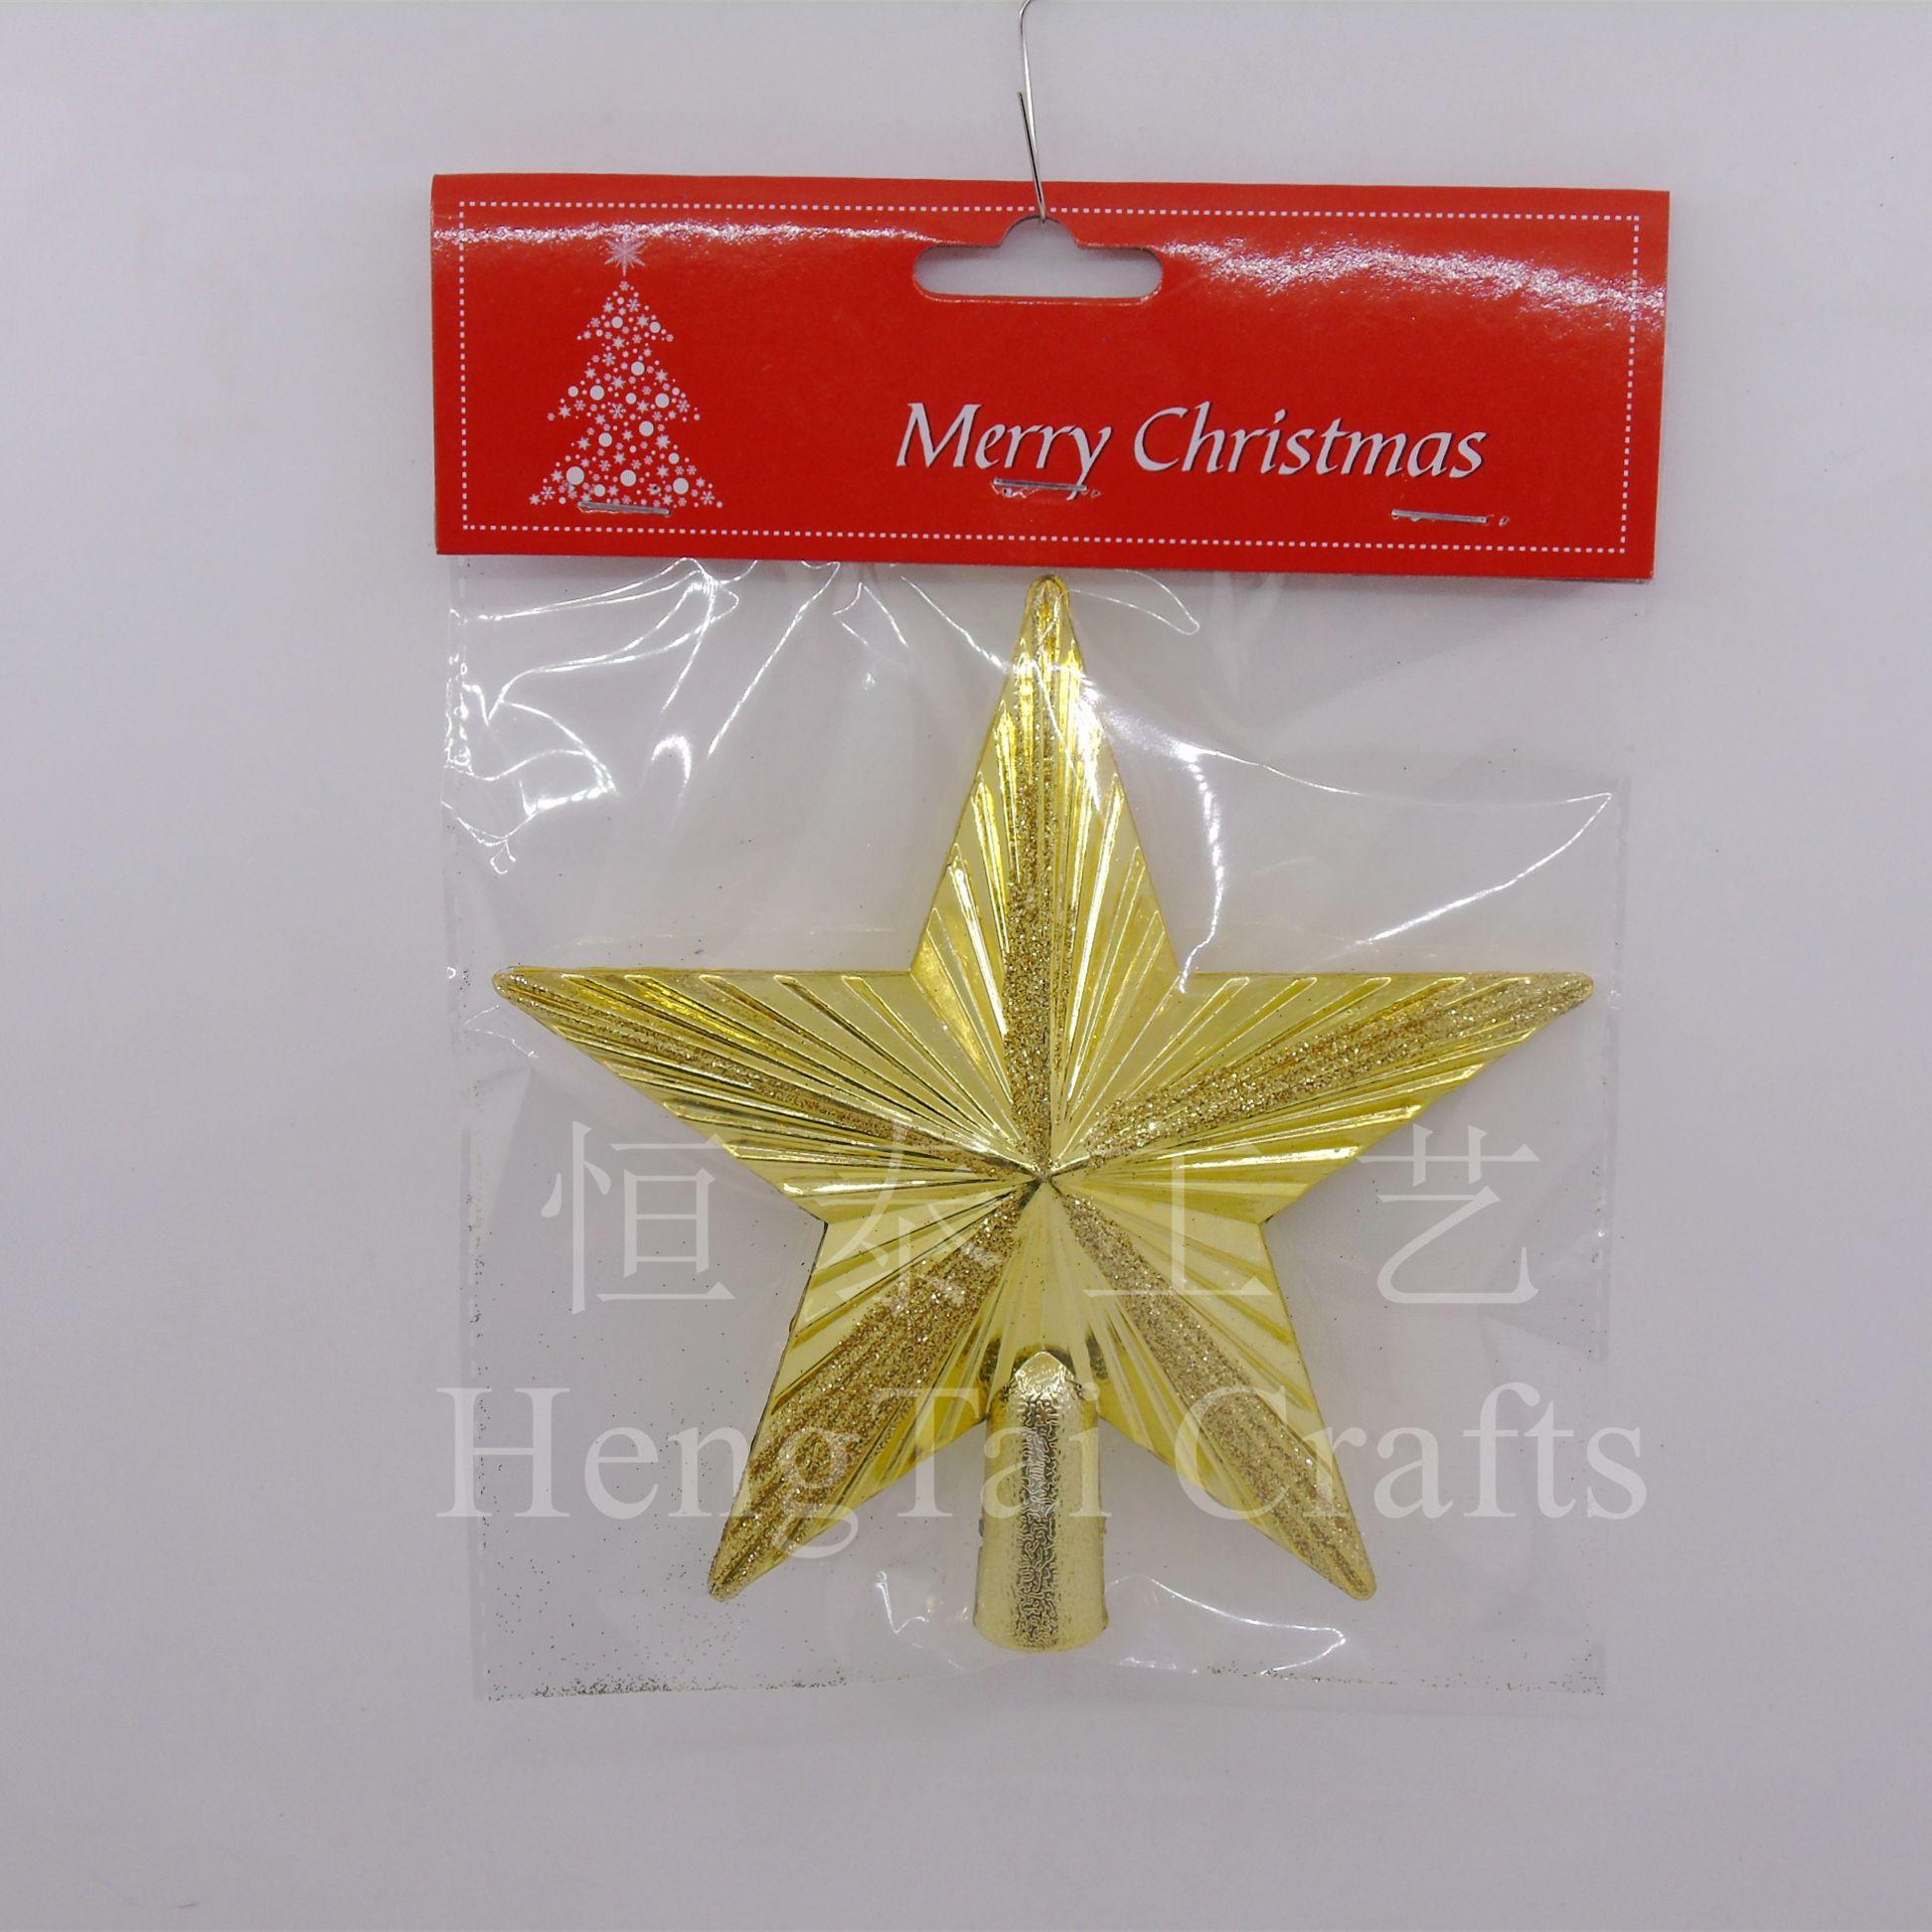 15X14.5CM圣诞电镀塑料五星树顶装饰品LI-NN21204